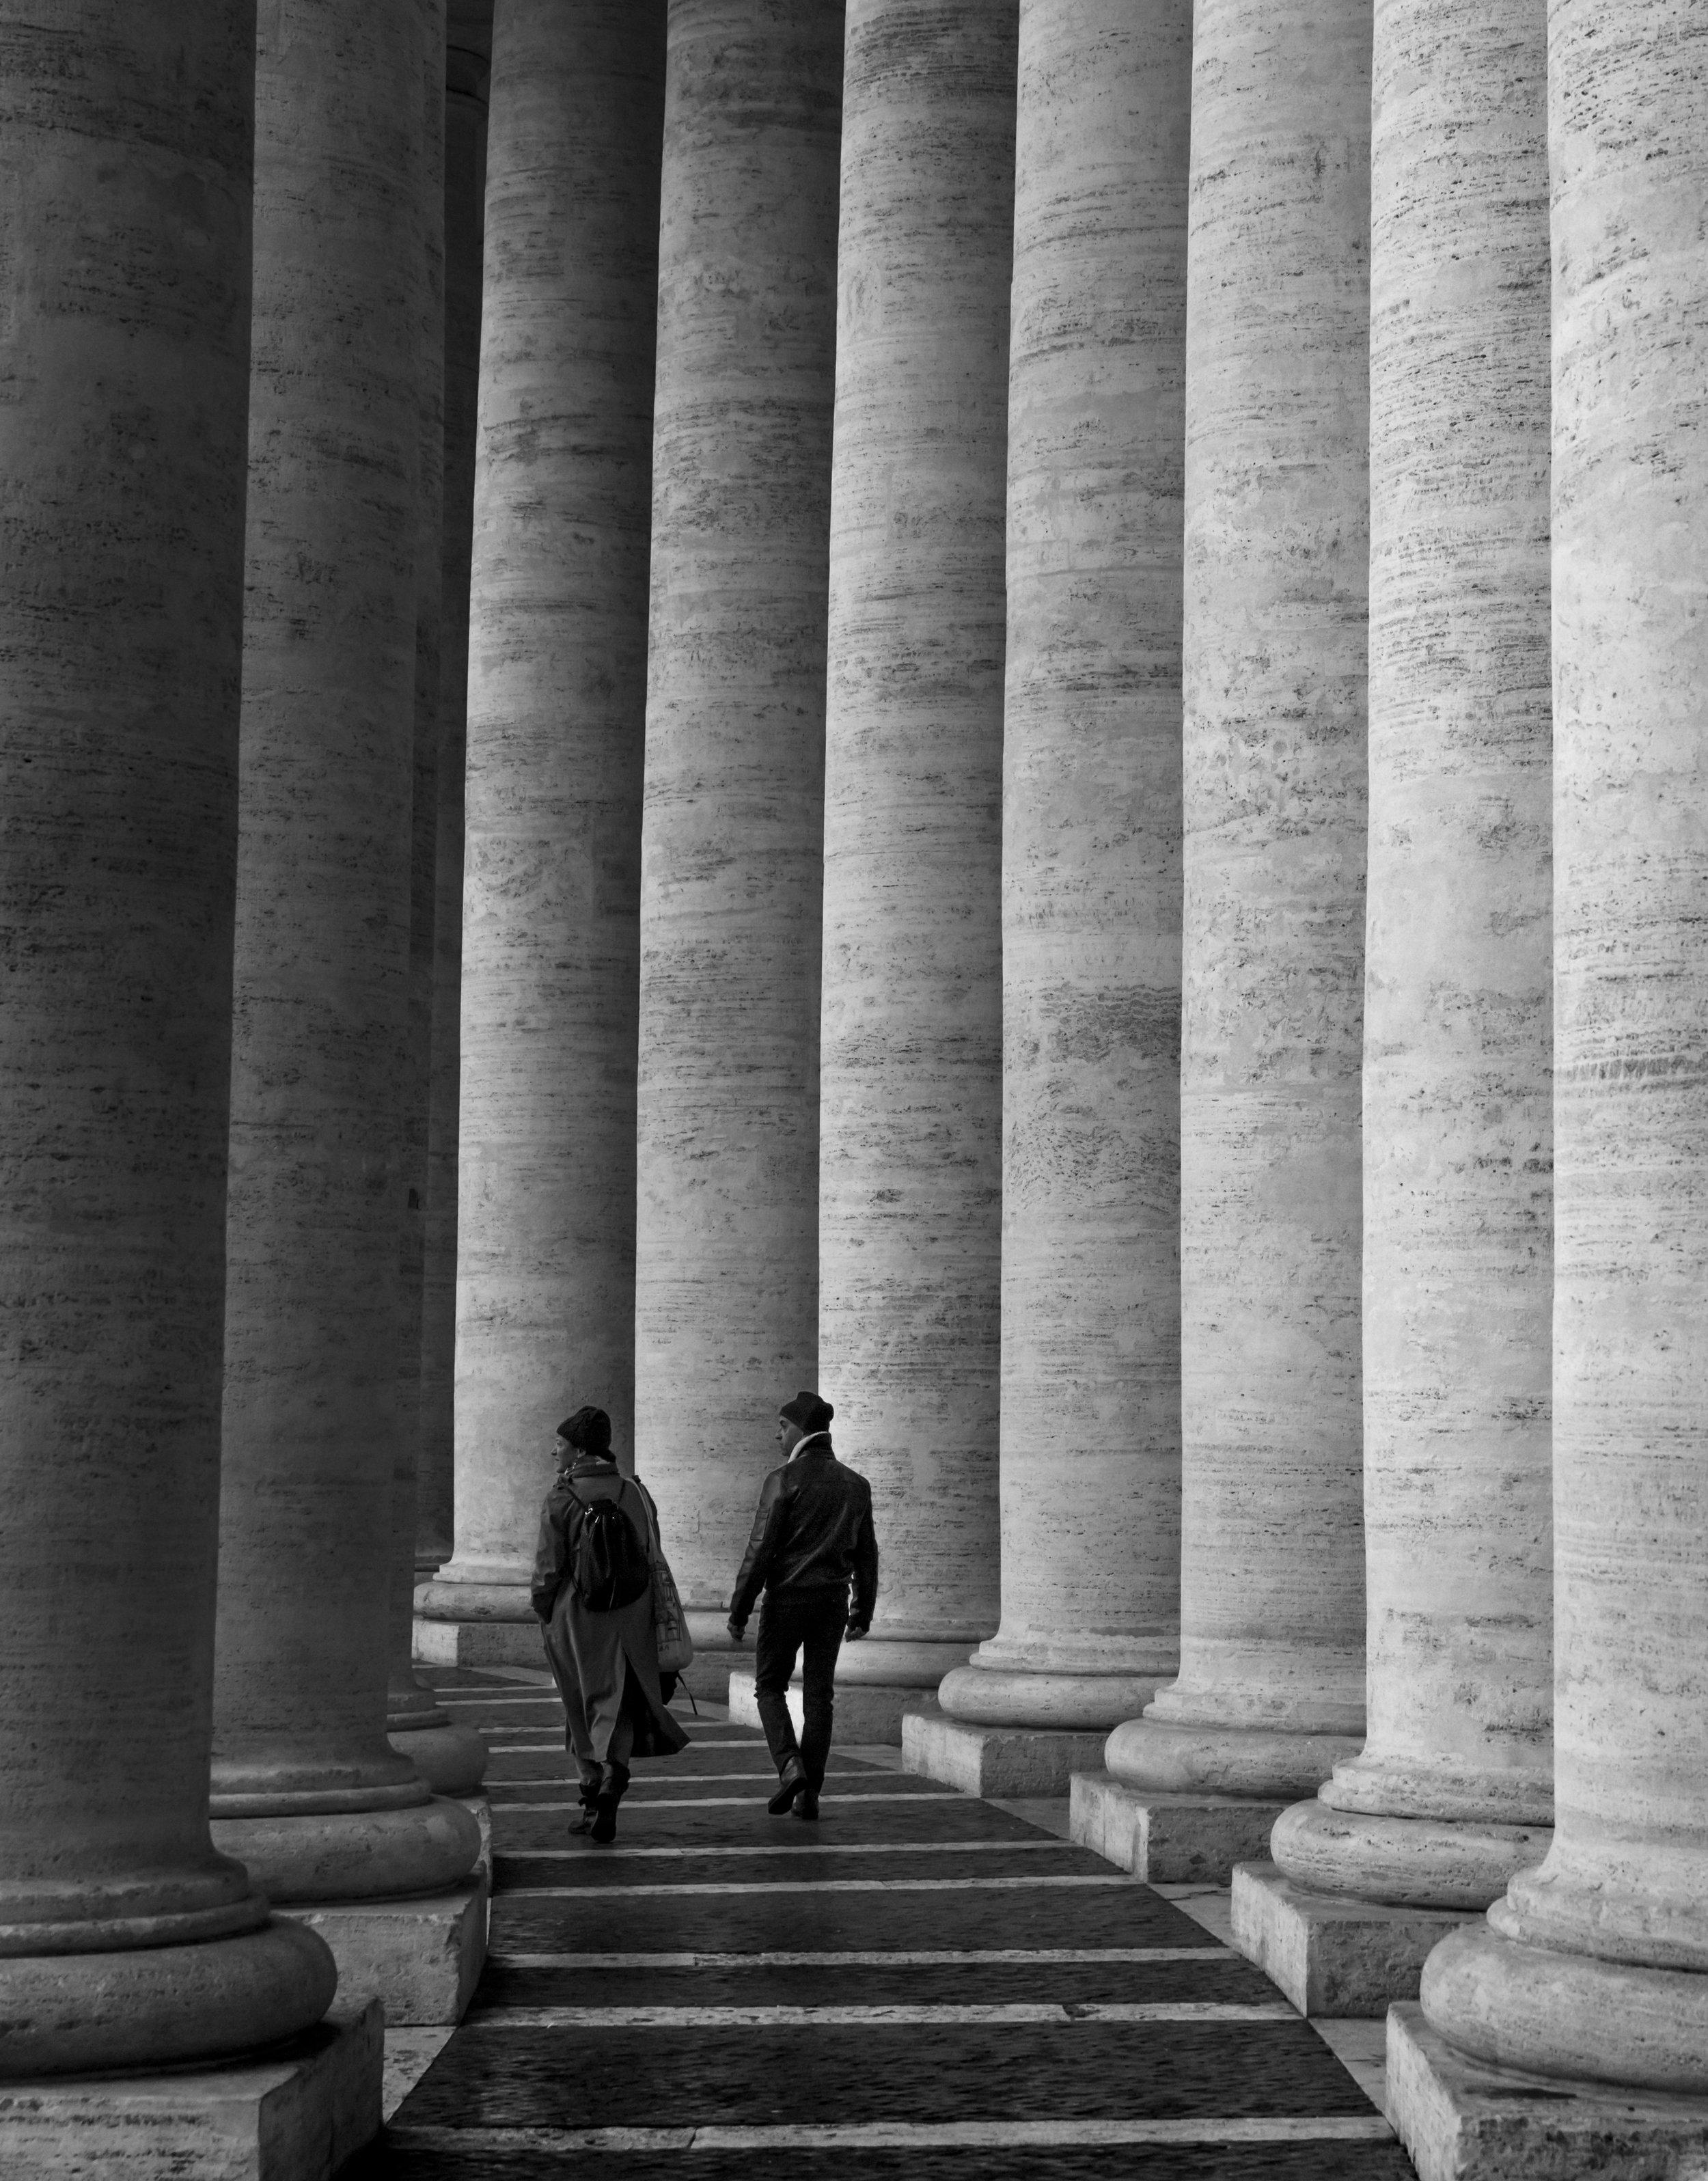 Copy of FrancescaDonnoli_Chiaroscuro_PhotographicPrint_70x57.jpg